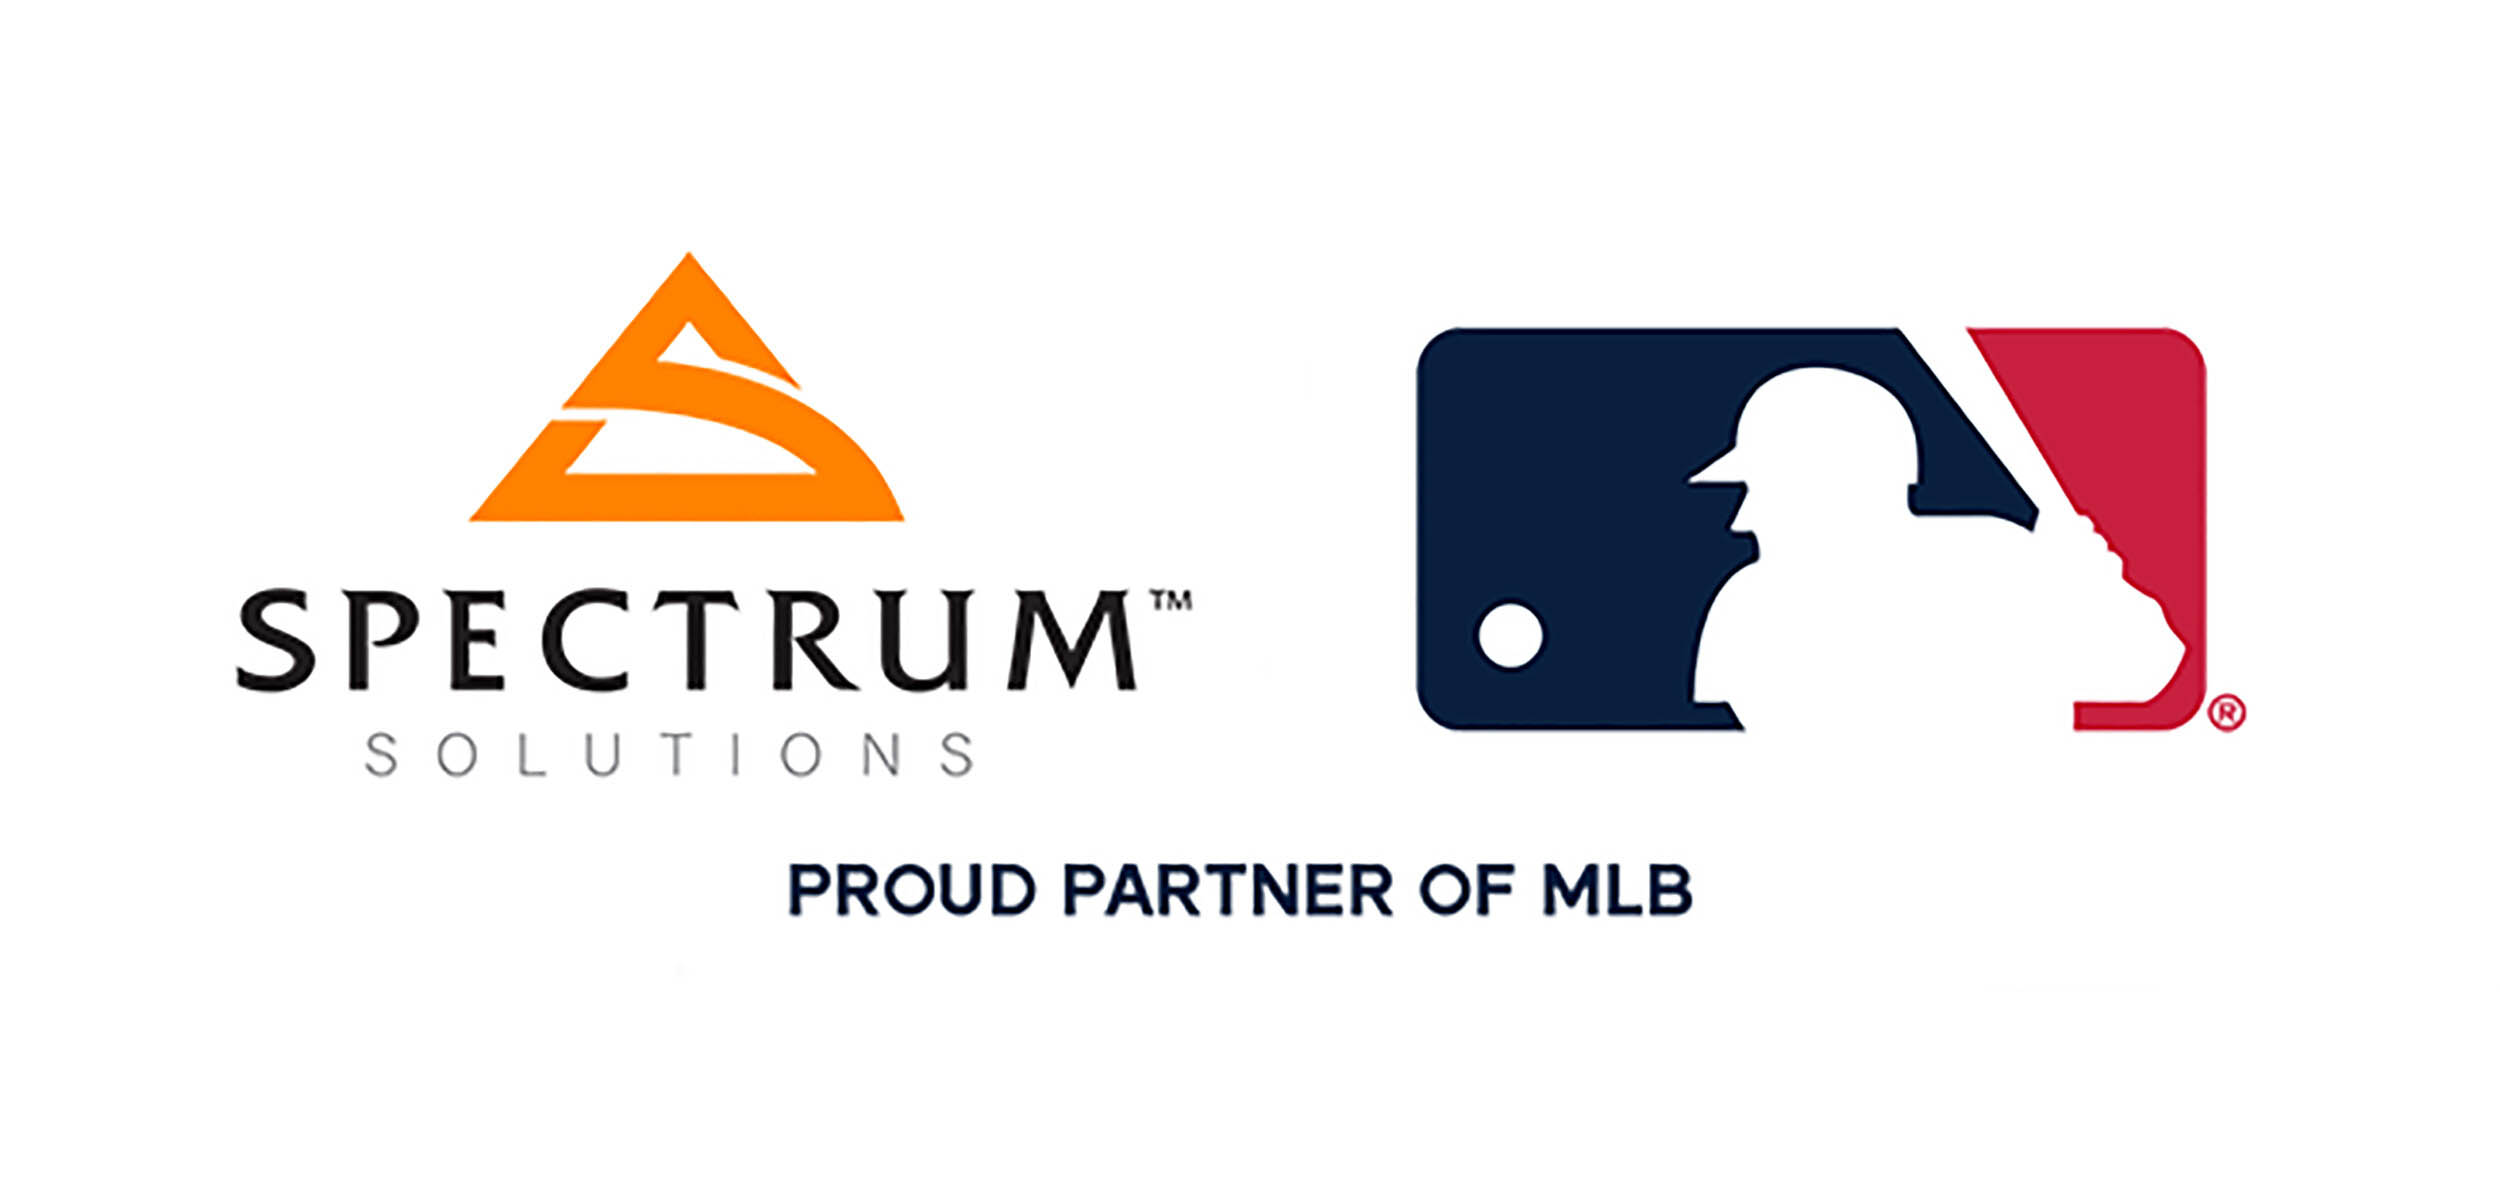 Spectrum_MLB-Brand-Partnership-cover